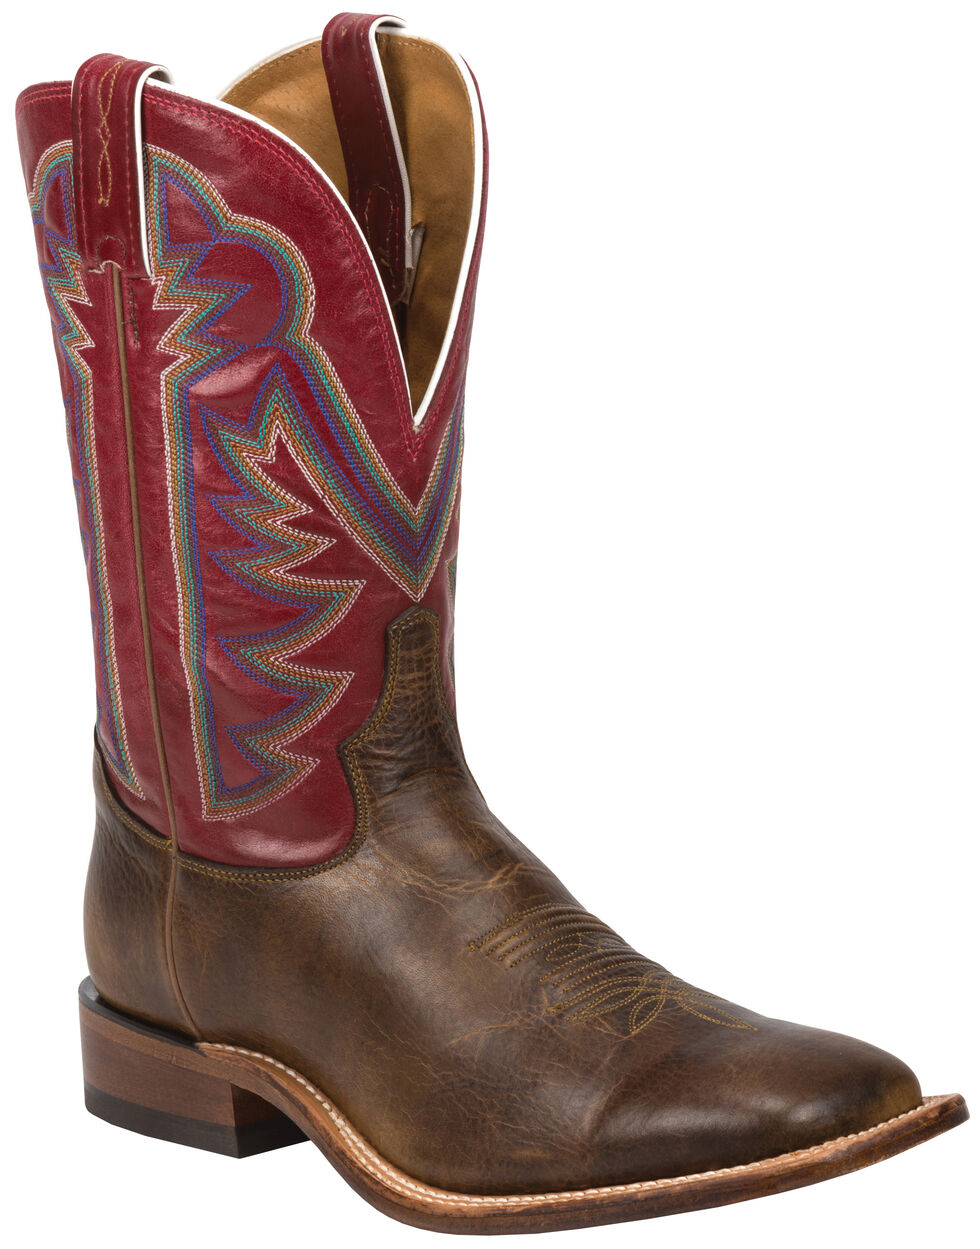 Tony Lama Tan Crush Blaze Americana Cowboy Boots - Square Toe , Tan, hi-res